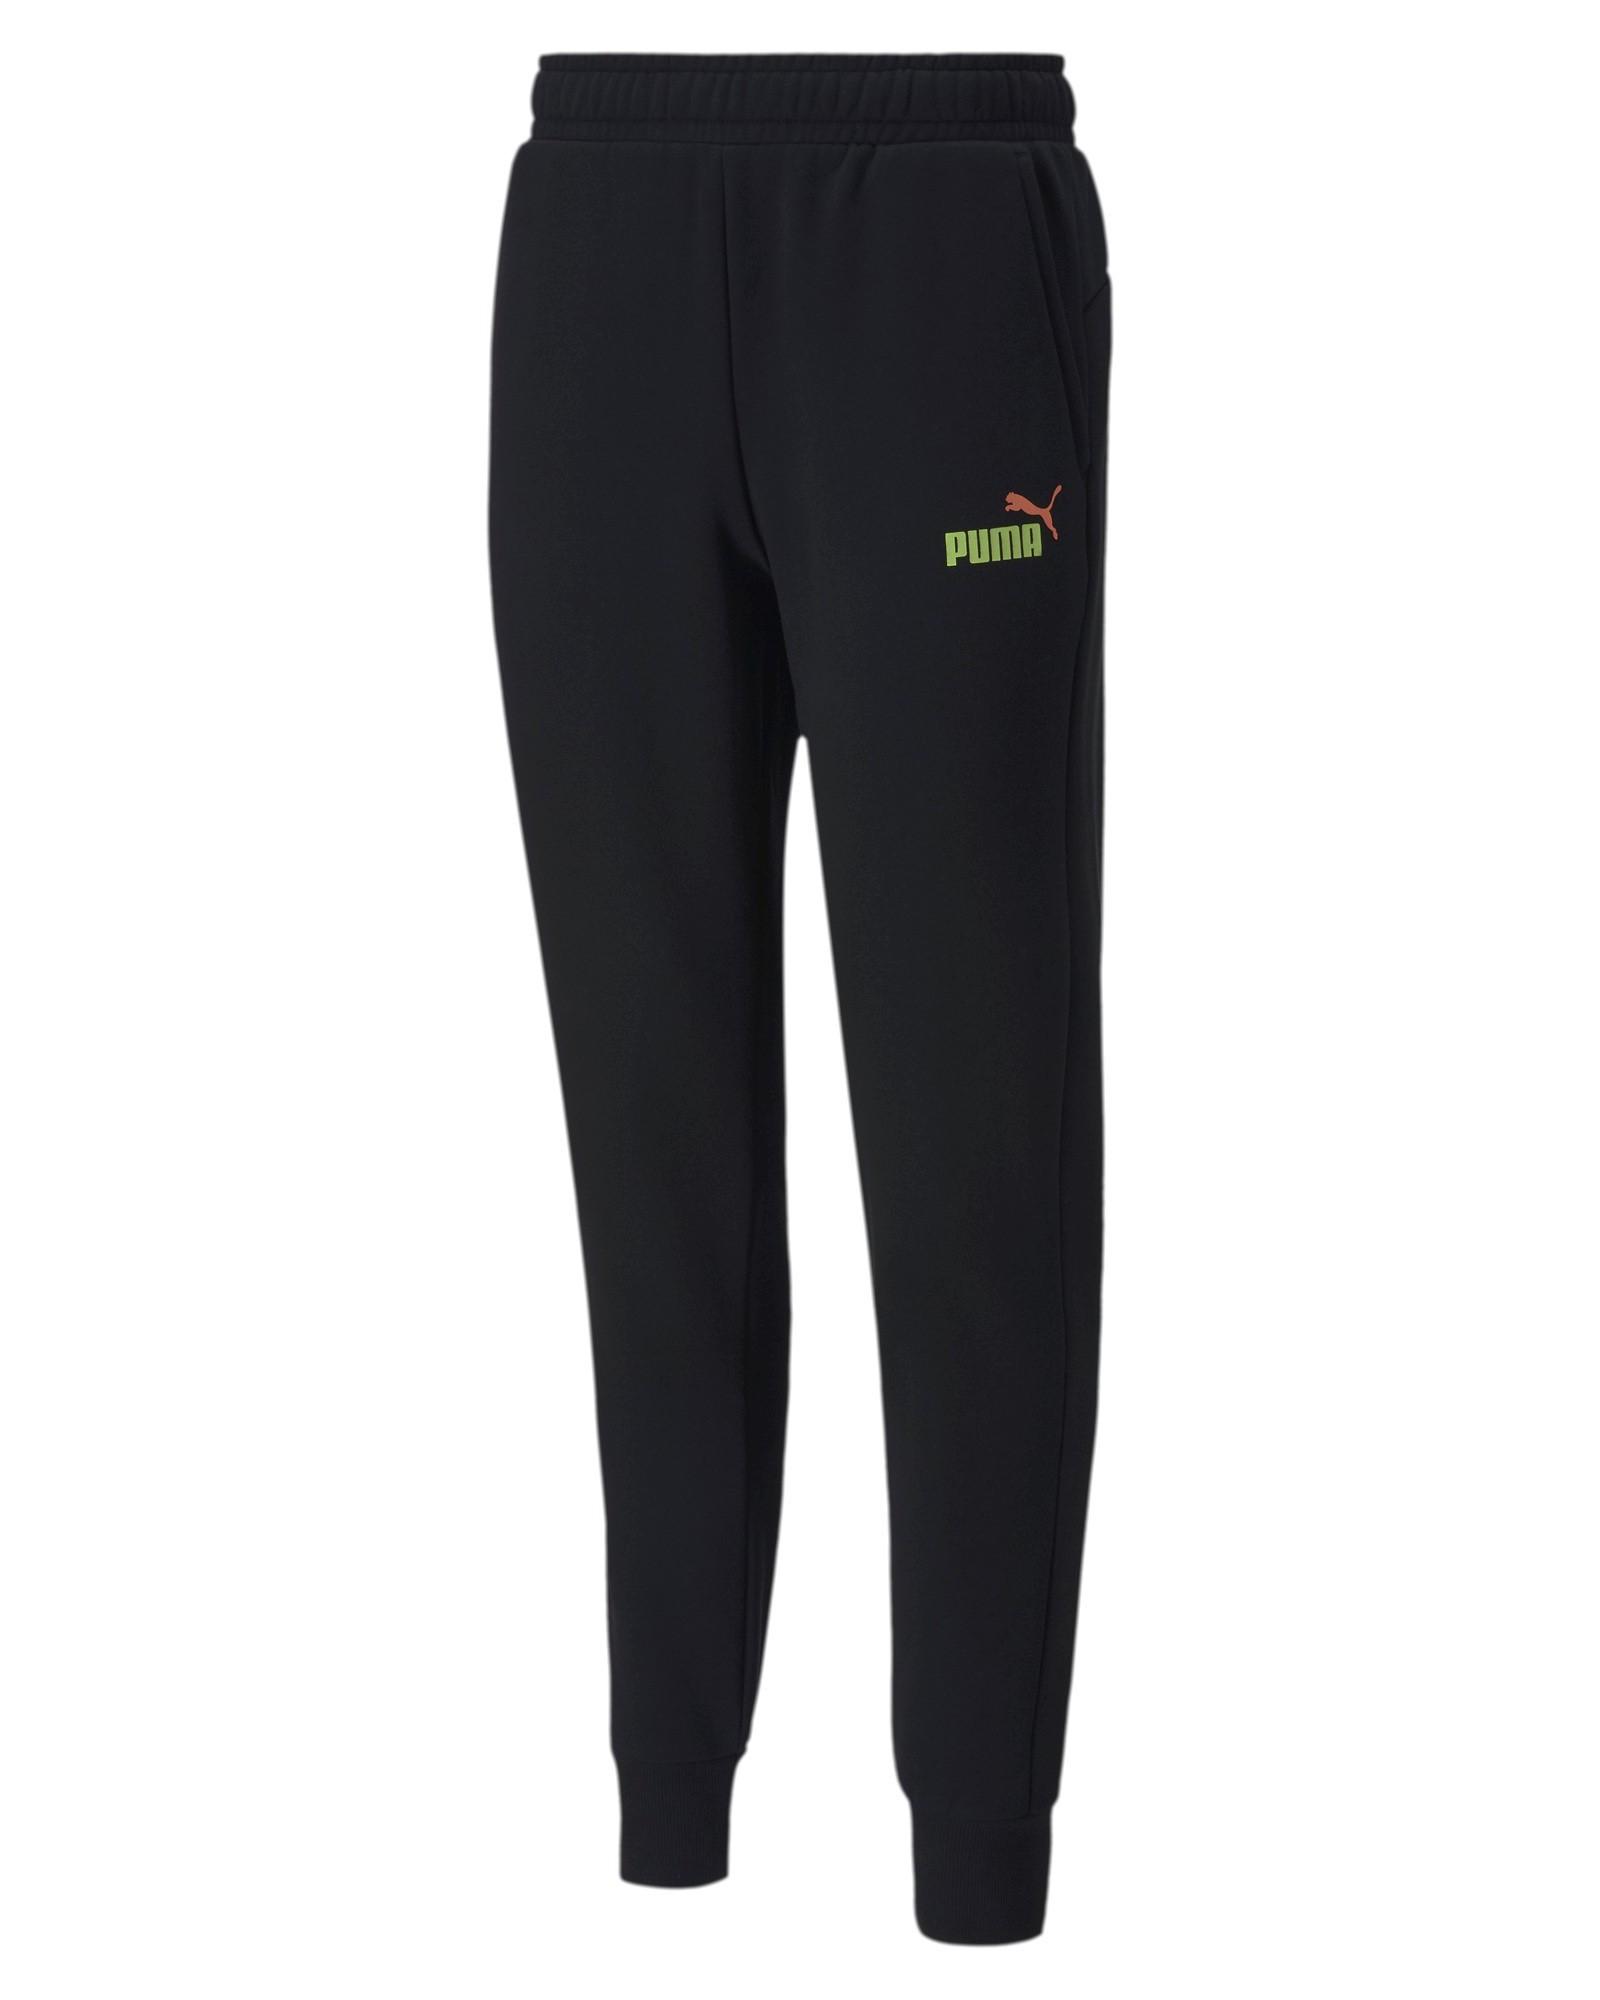 Puma Pantaloni tuta Pants Nero cotone ESS 2 Col Logo Fleece con tasche Uomo 0